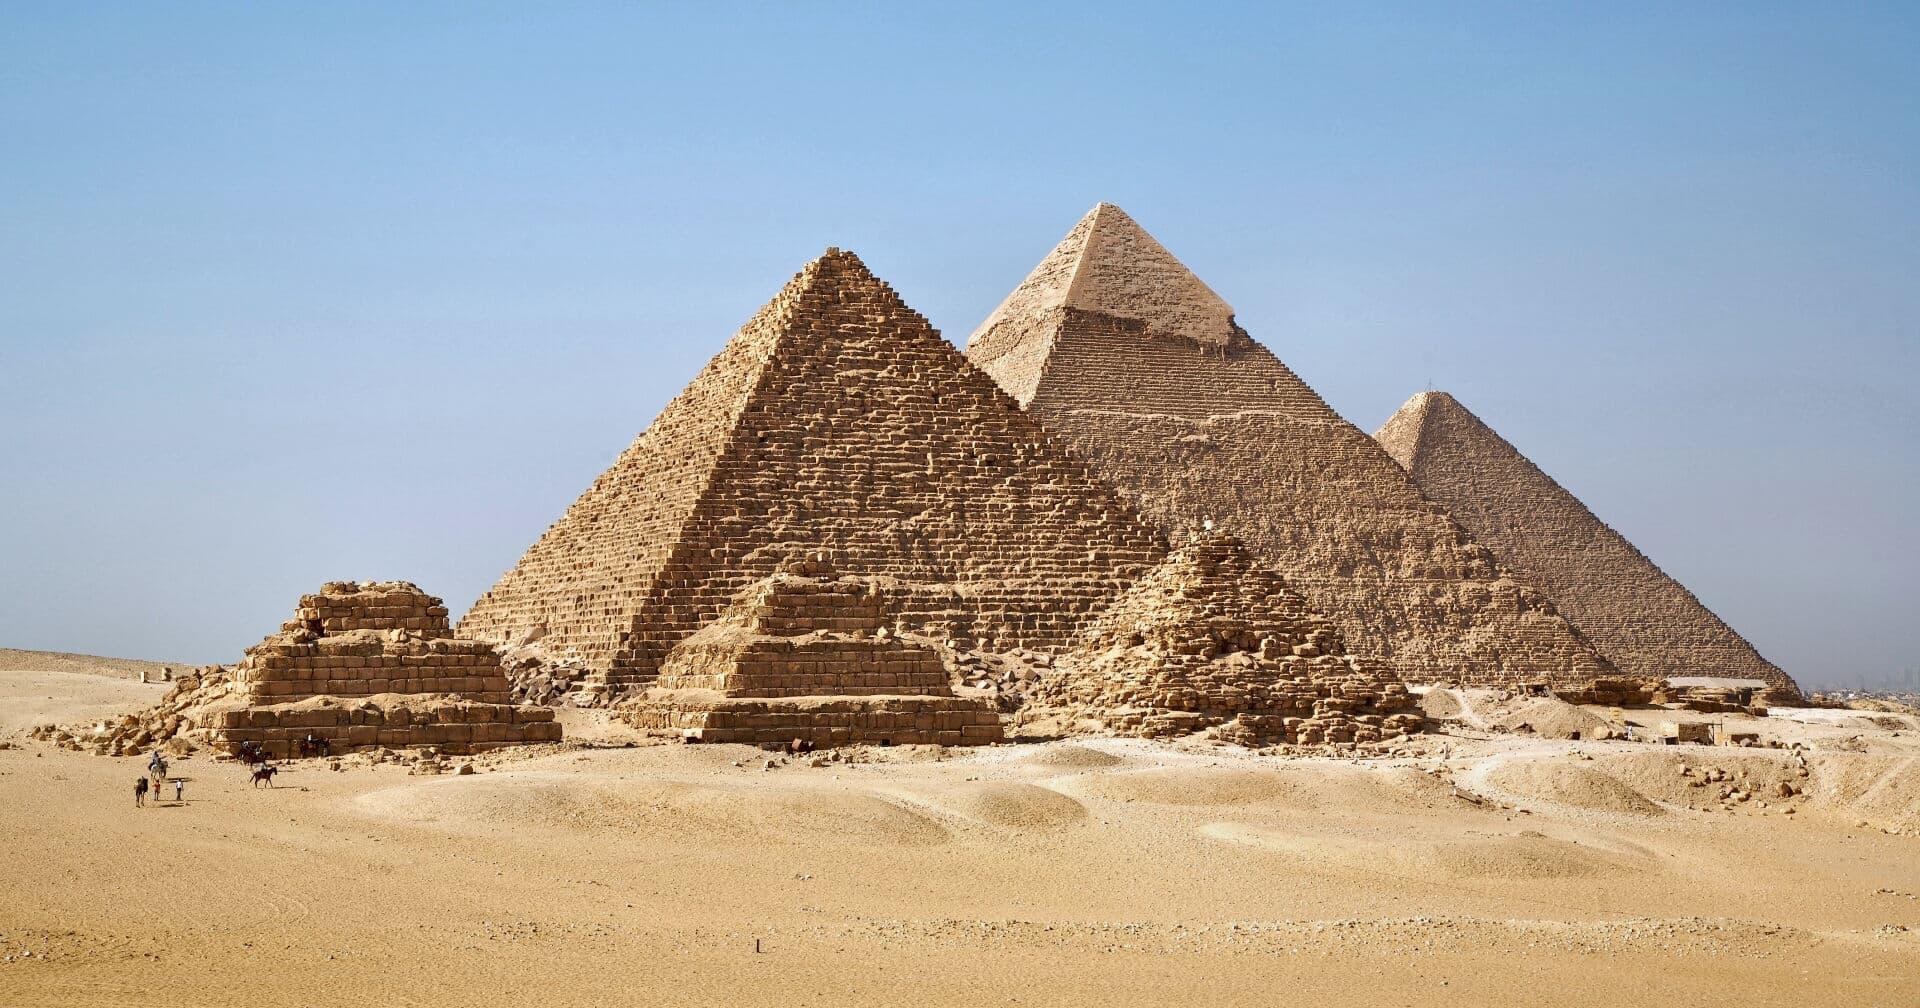 Cairo/Giza photo